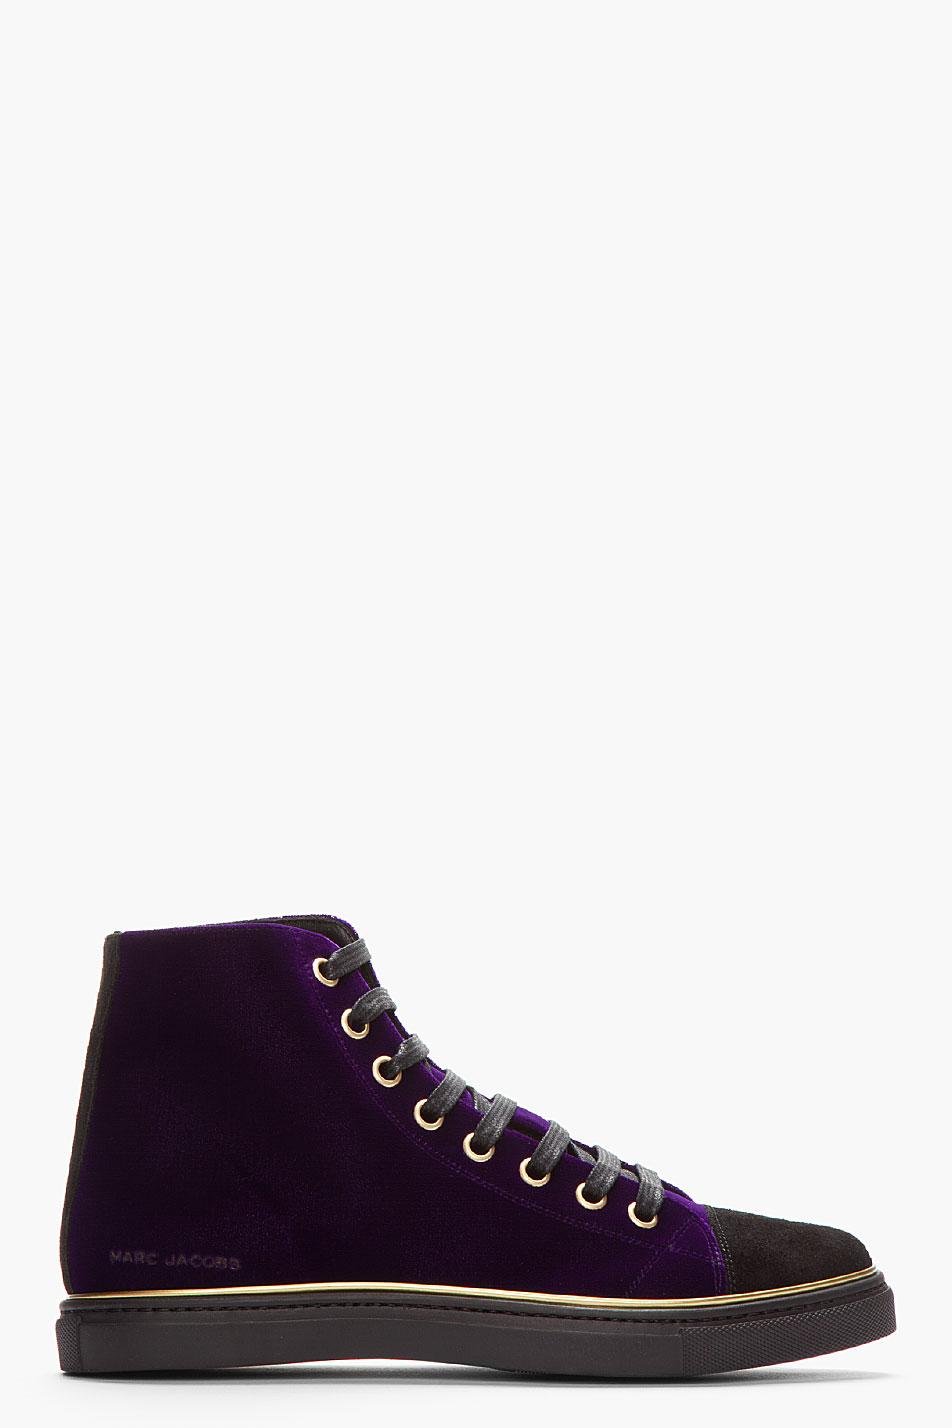 Lyst Marc Jacobs Purple Velvet Gold Trimmed High Top